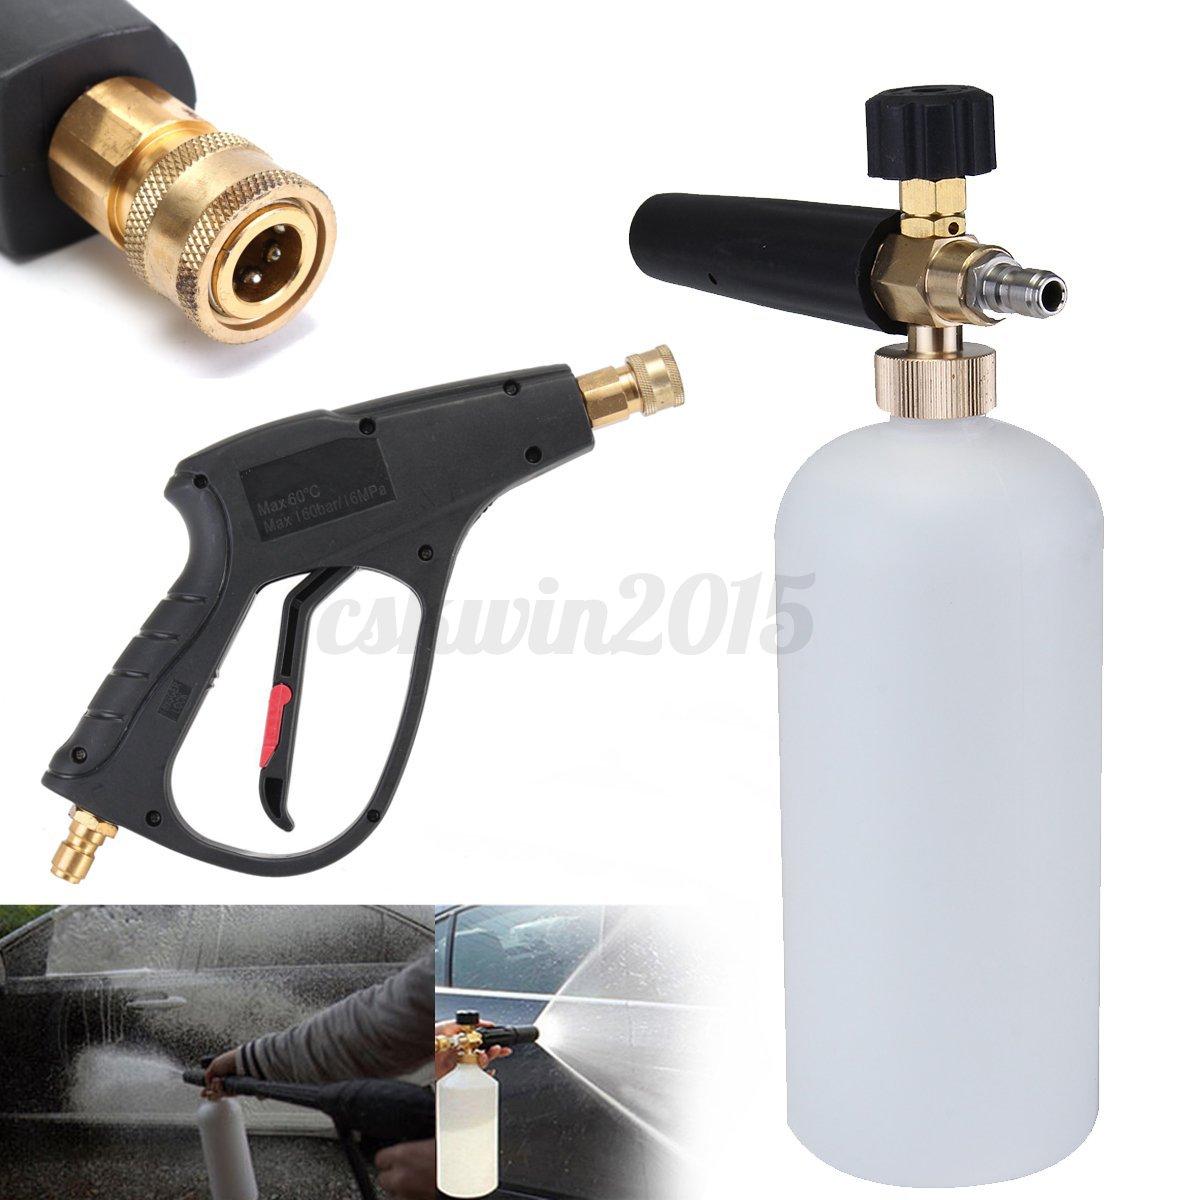 haute pression laveuse nettoyeur nettoyage brosse pistolet buse lavage voiture ebay. Black Bedroom Furniture Sets. Home Design Ideas